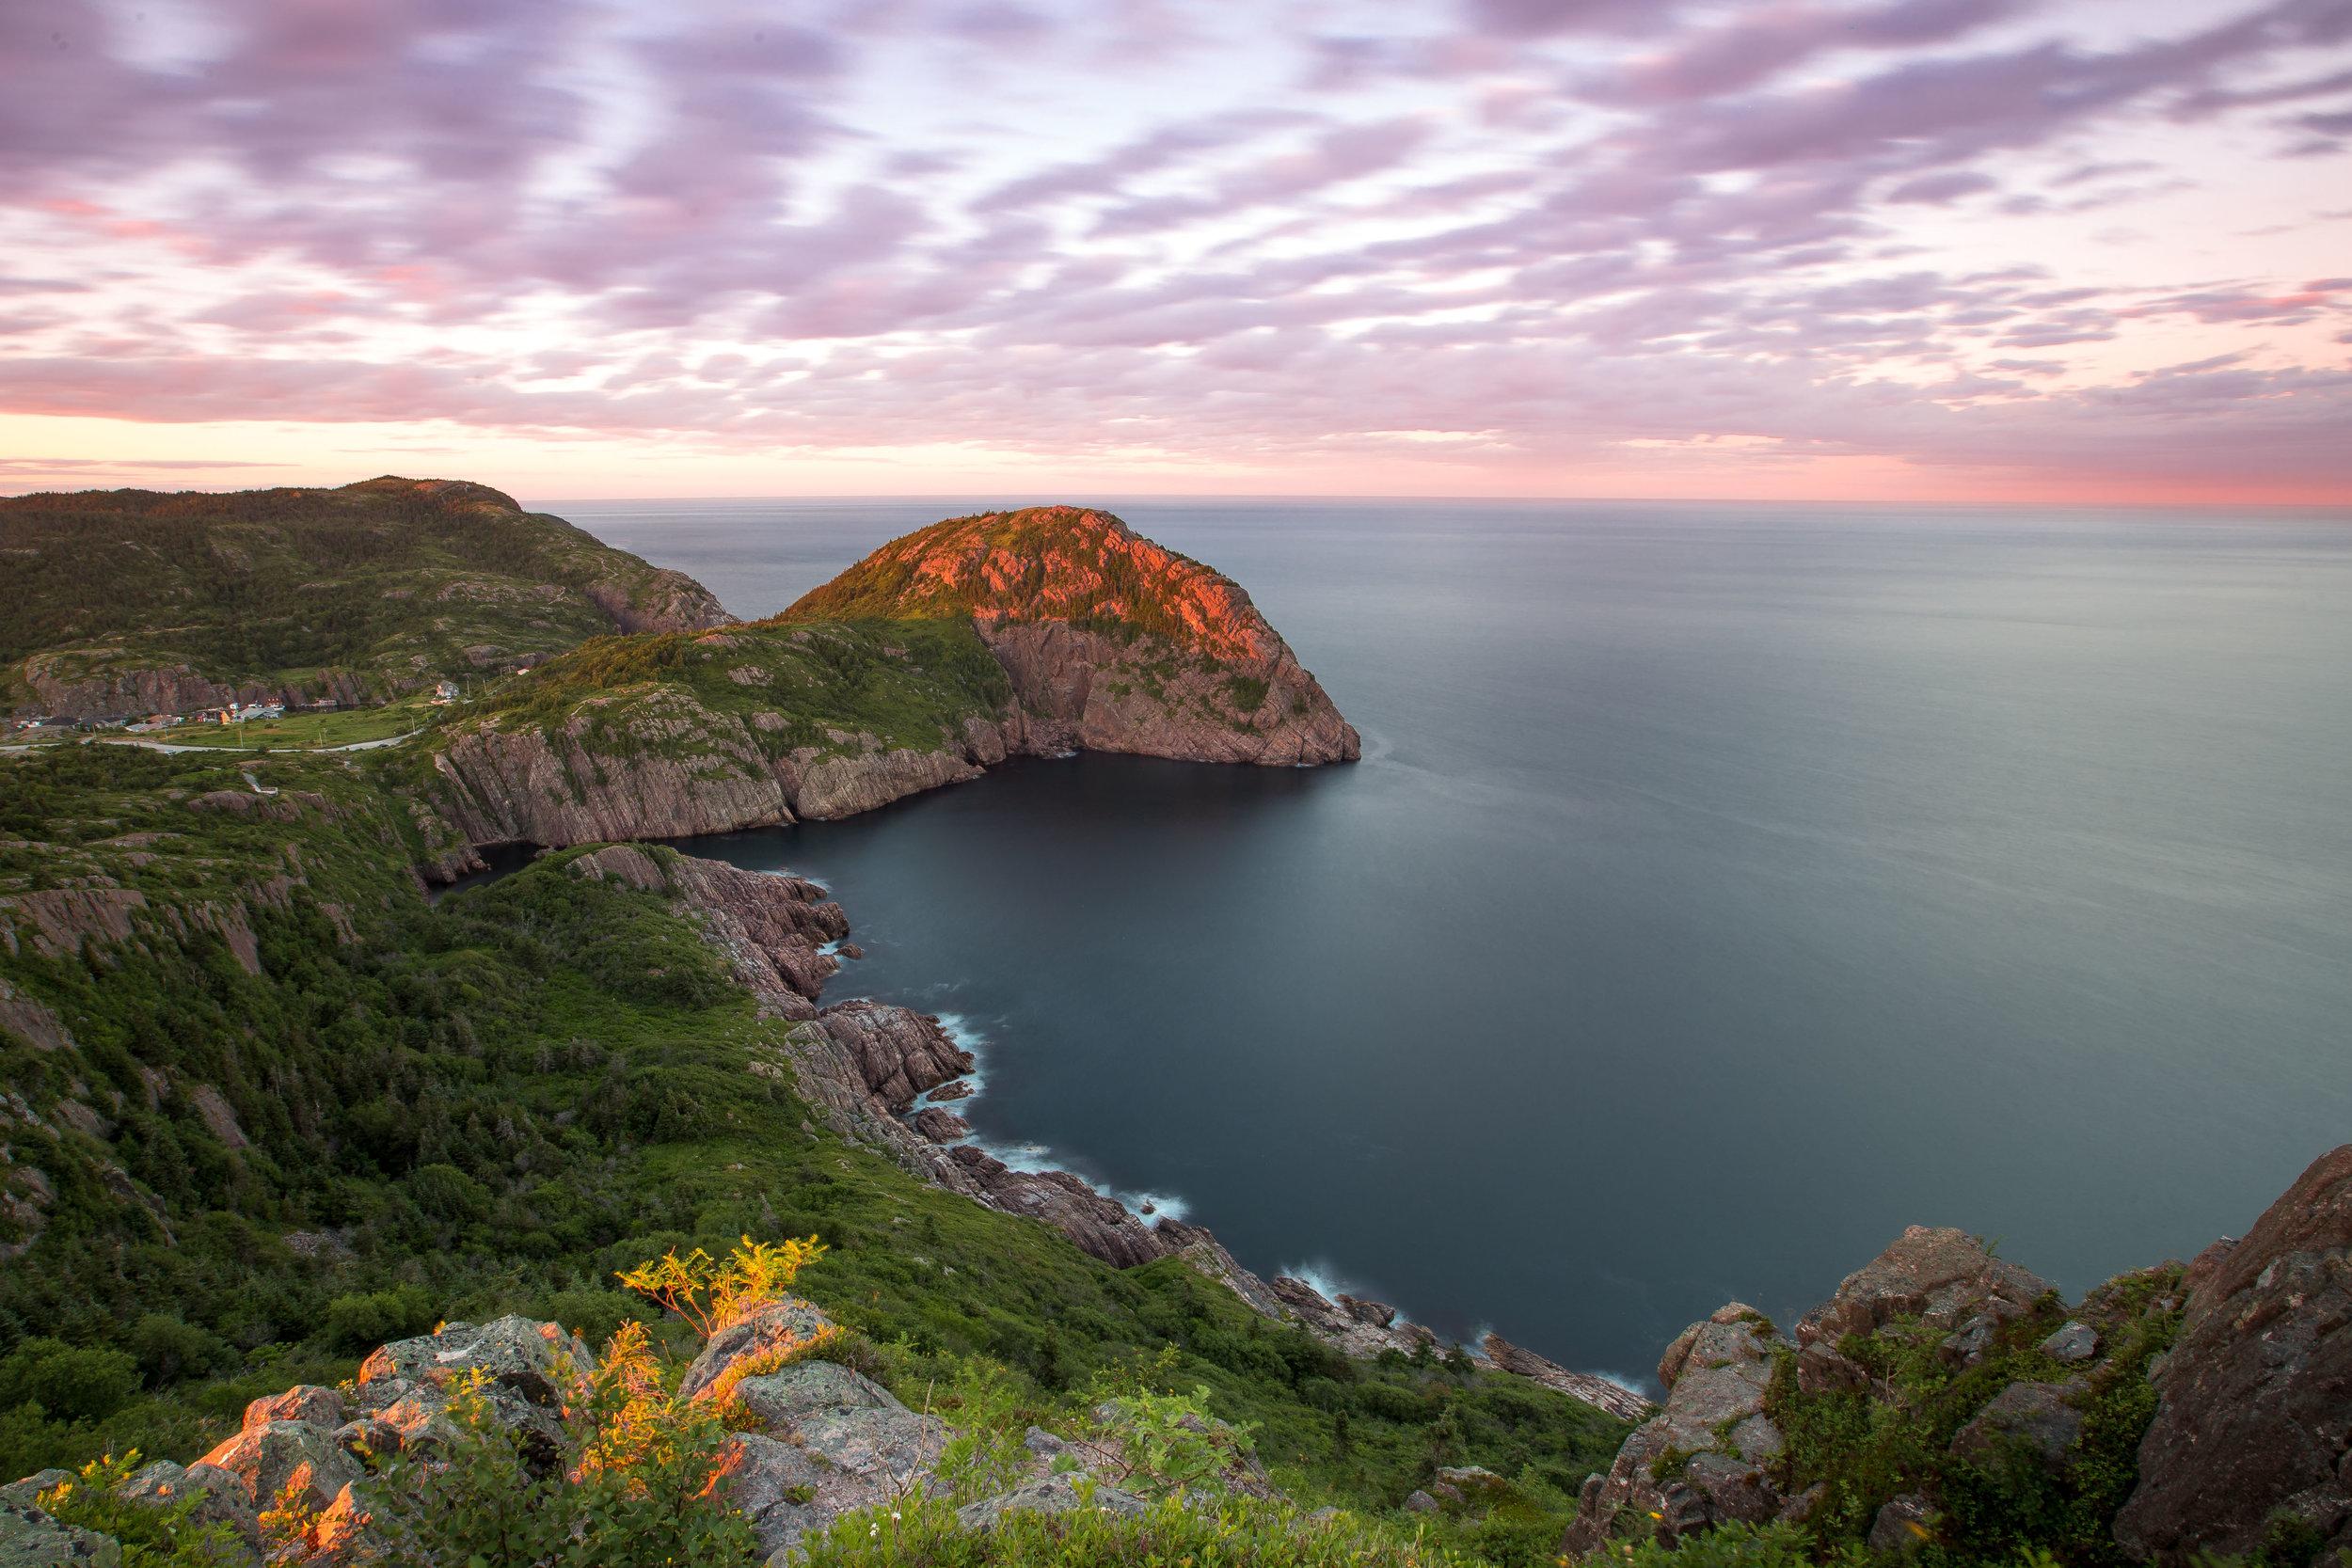 Cuckold's Cove Sunset